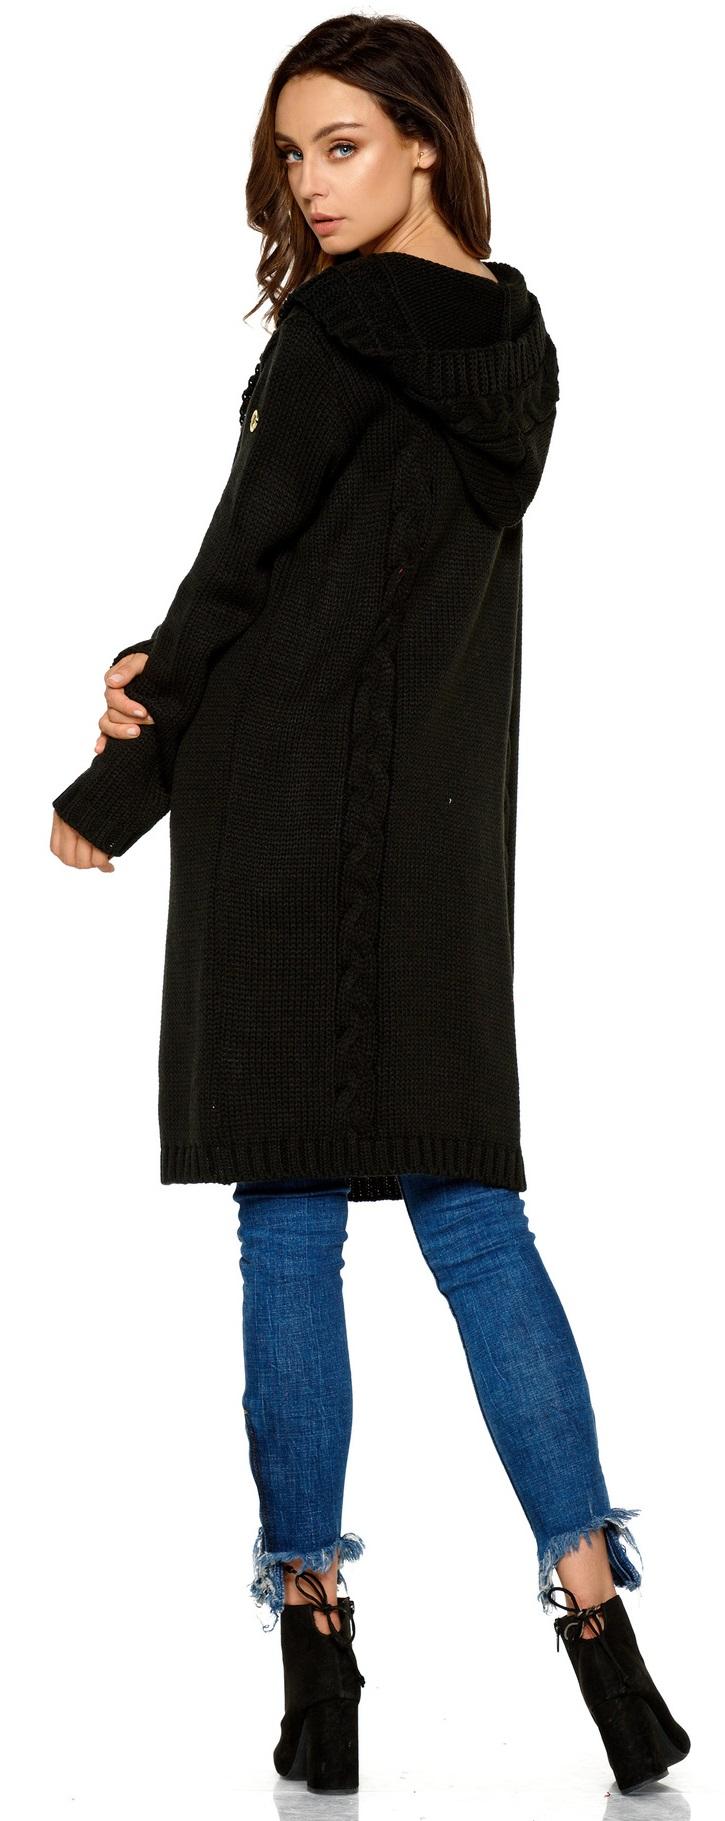 modischer Cardigan mit Kapuze Knielang hochwertiger Strickjacke Damen Jacke